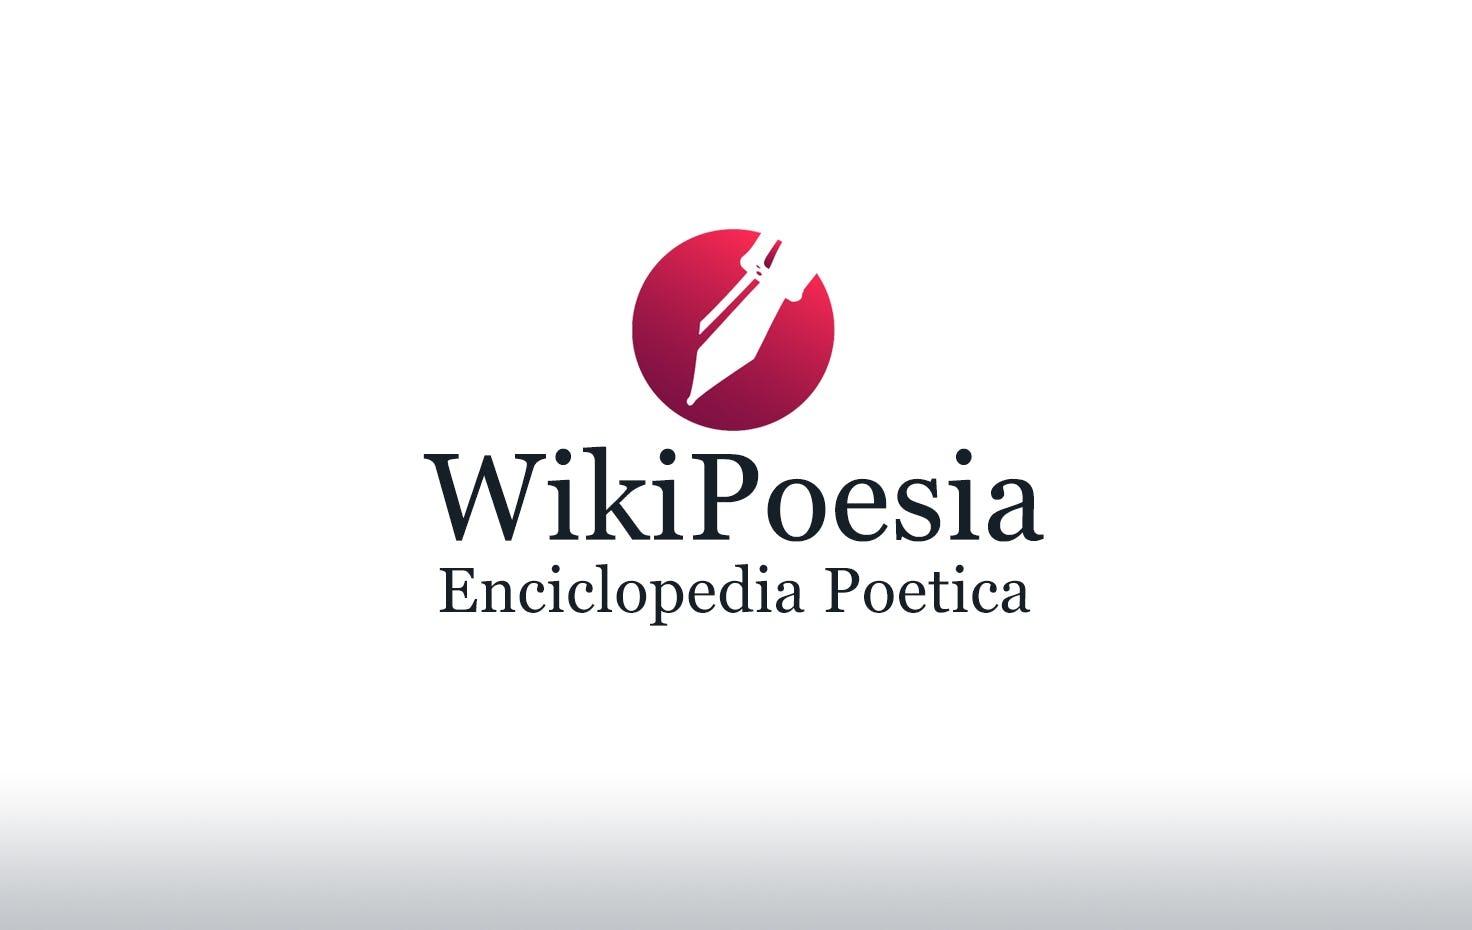 1579856150577990-wikipoesia-1632037153.jpg